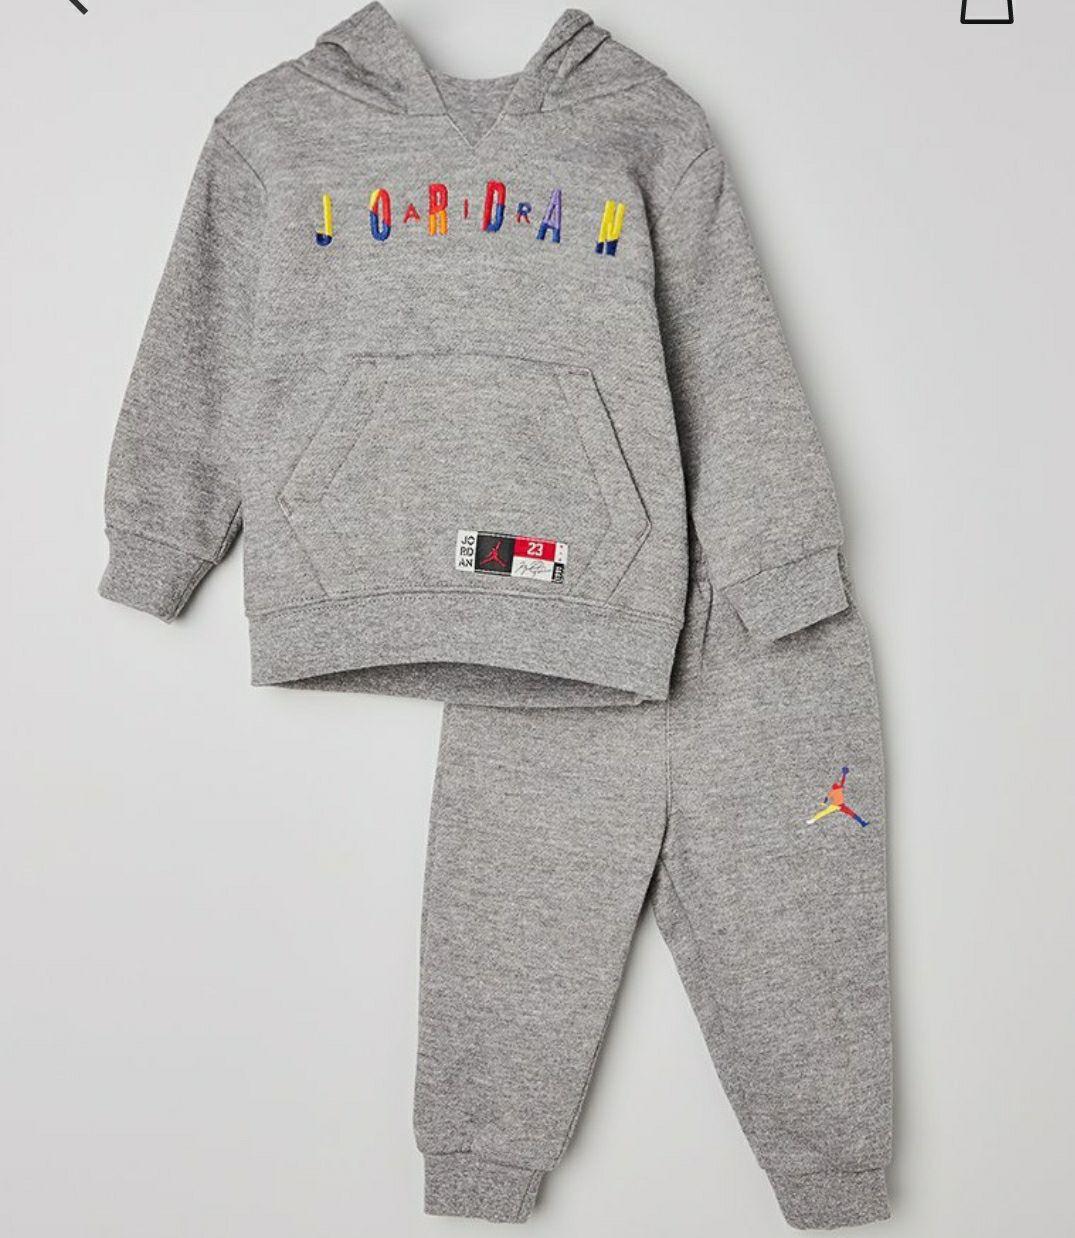 Jordan kids kleding